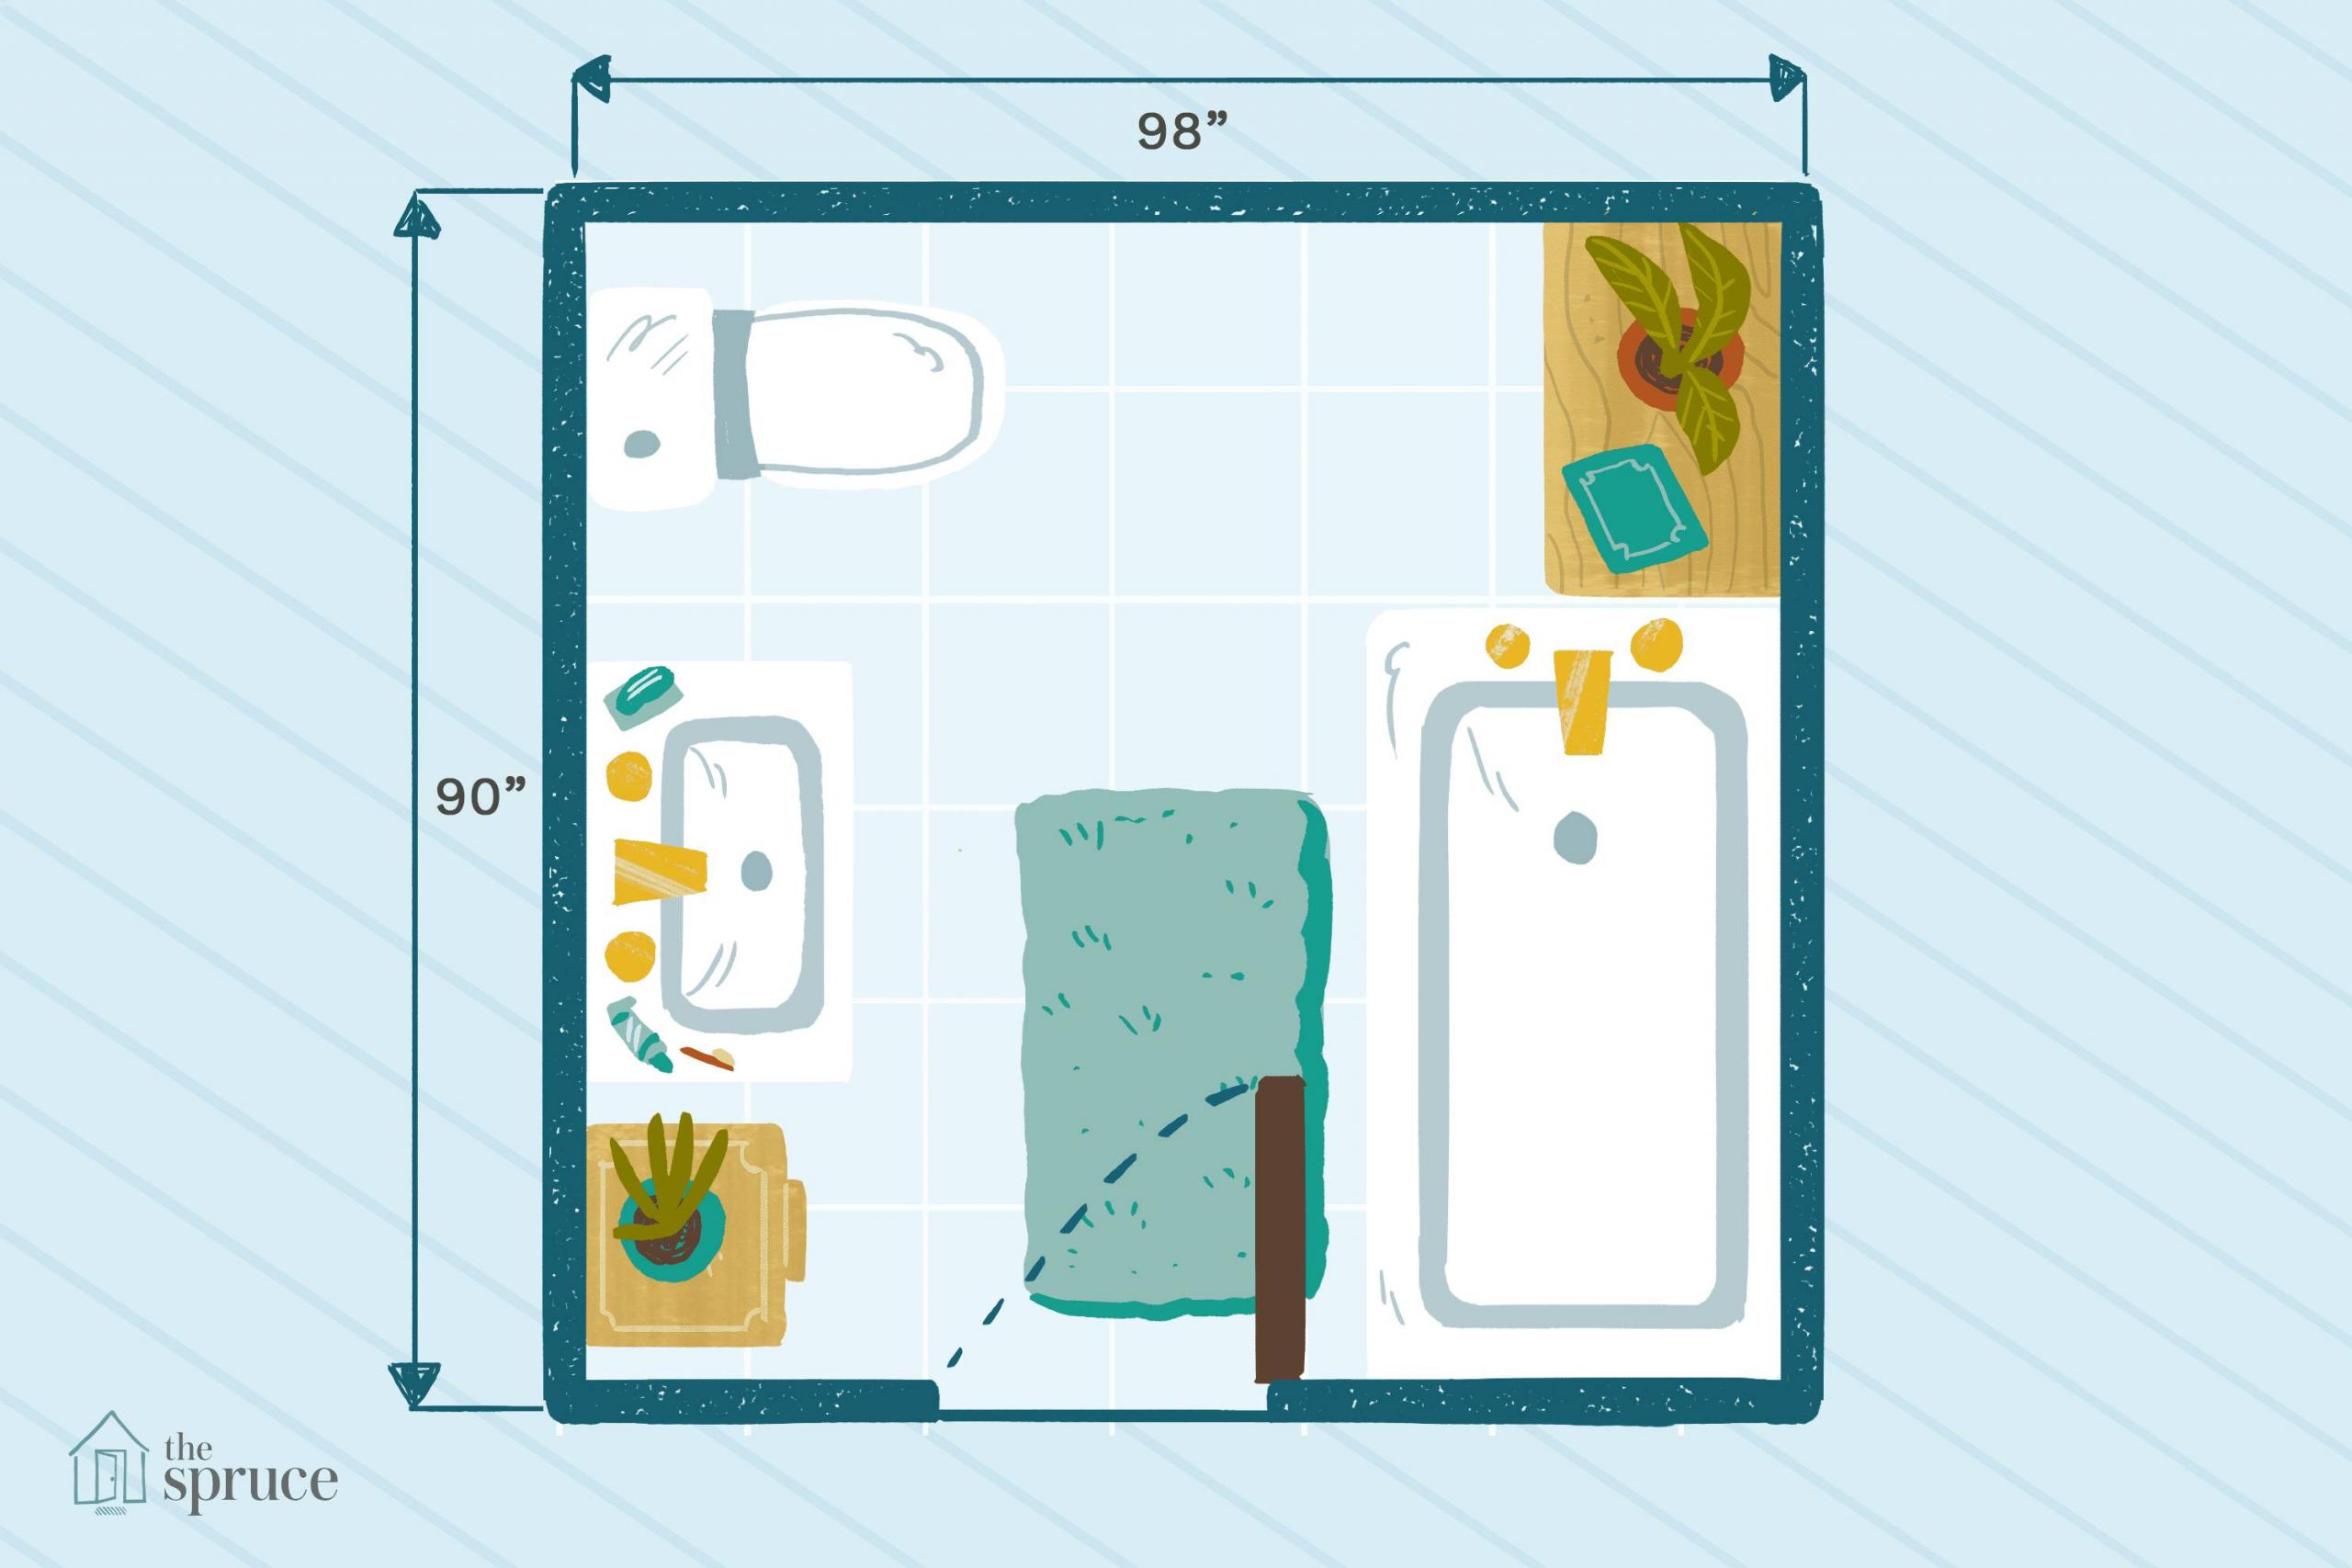 free bathroom floor plans 03 Final 5c768fe346e0fb0001edc746